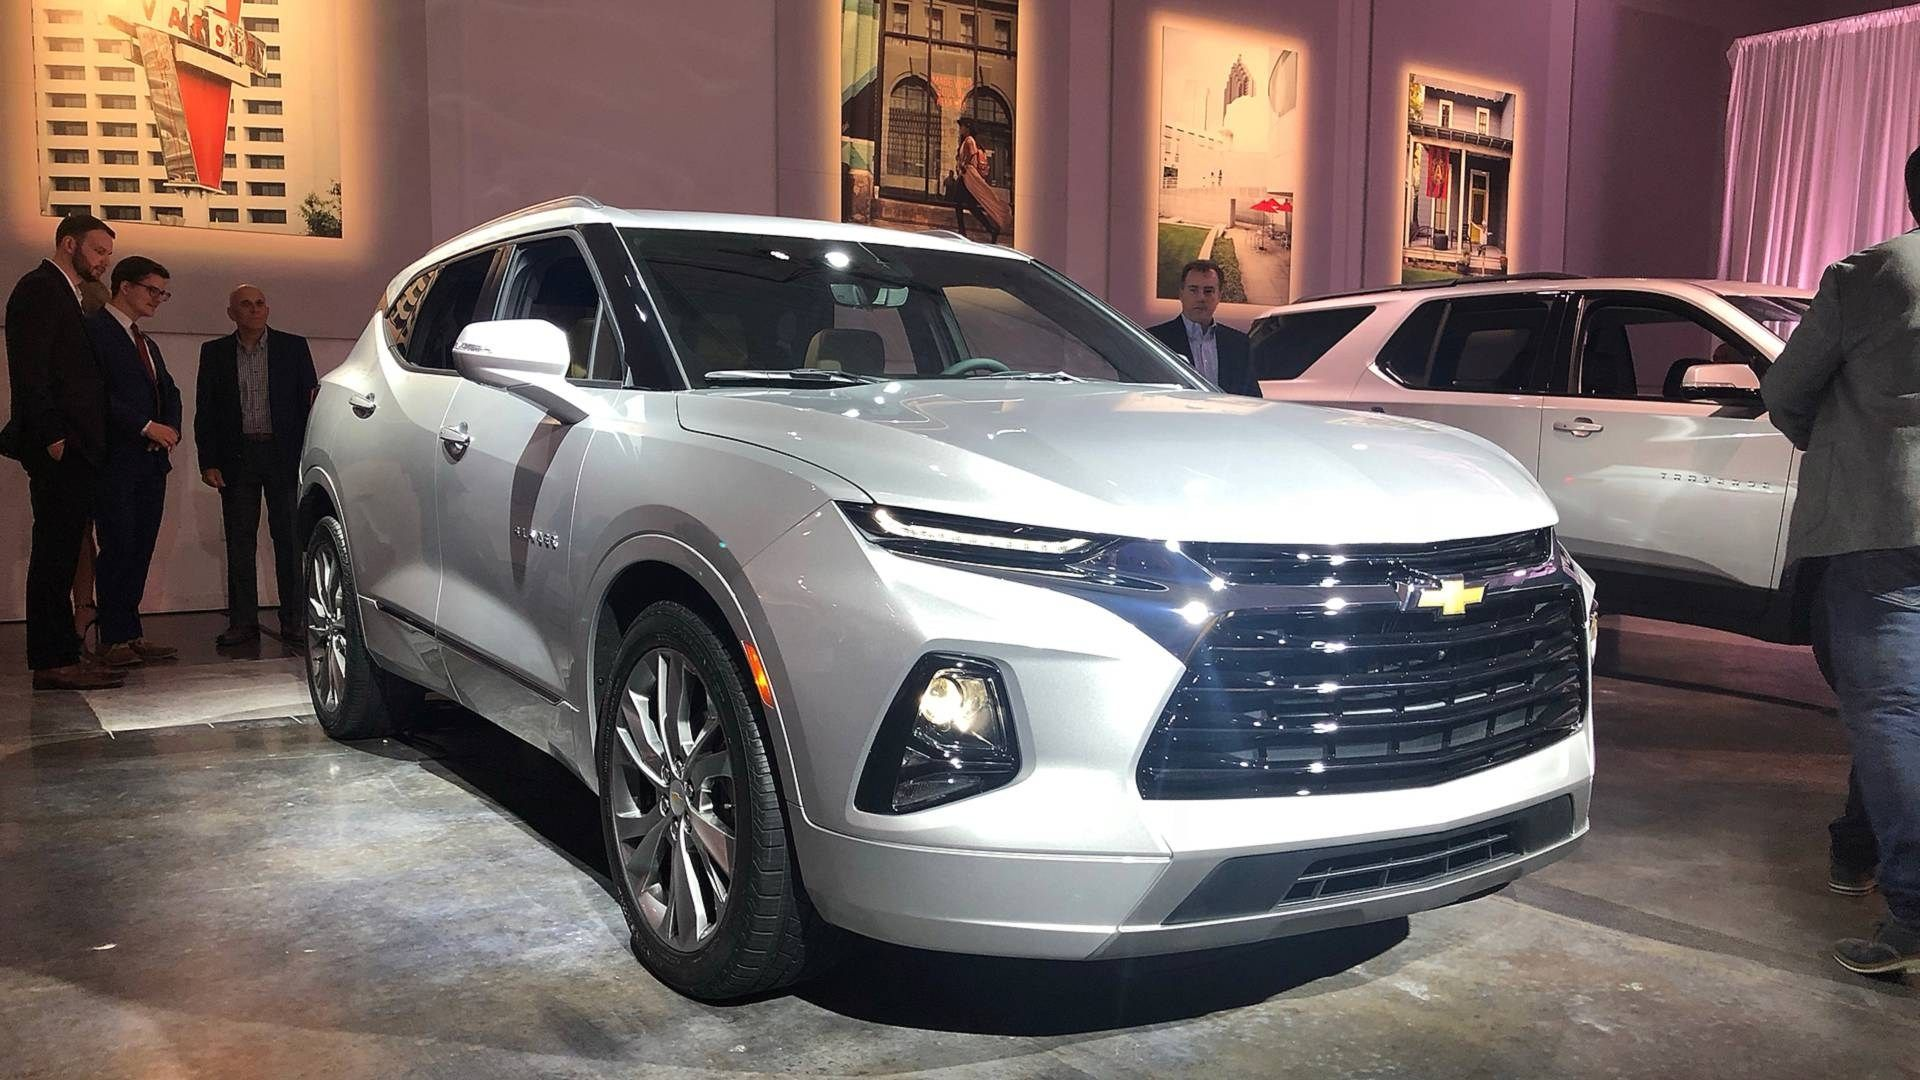 Chevrolet K5 Blazer 2020 Price And Release Date Chevrolet Blazer Chevrolet Chevrolet Trailblazer